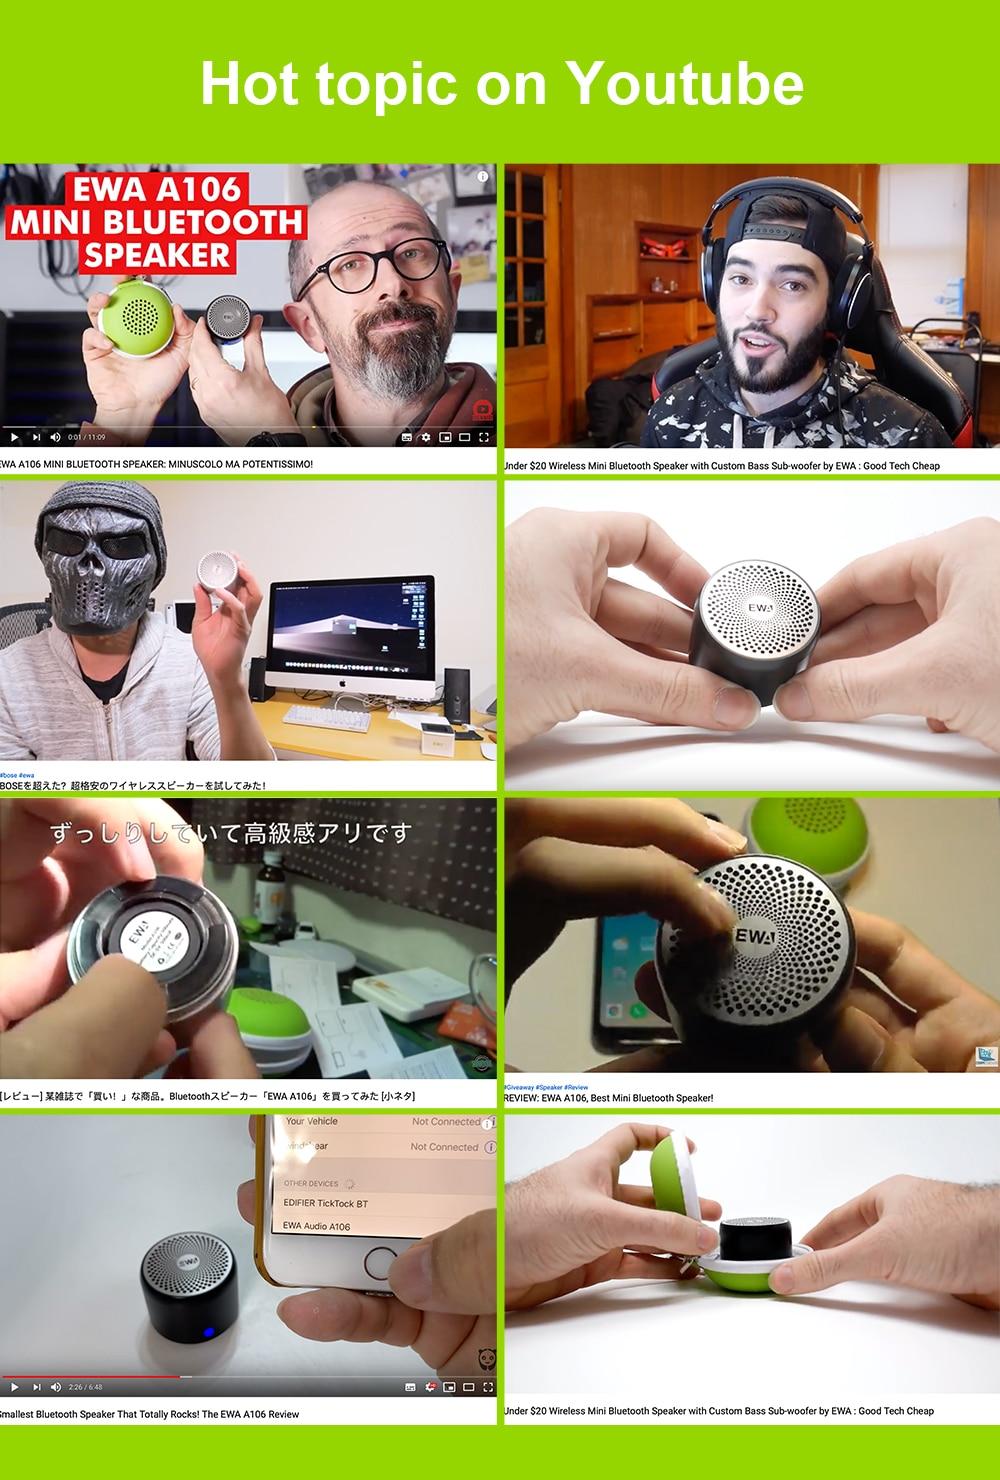 EWA Super-mini Waterproof Bluetooth Speaker 2018 Japan Best Sound/Bass Quality EWA A106 Pro Portable Speaker Bluetooth 5.0